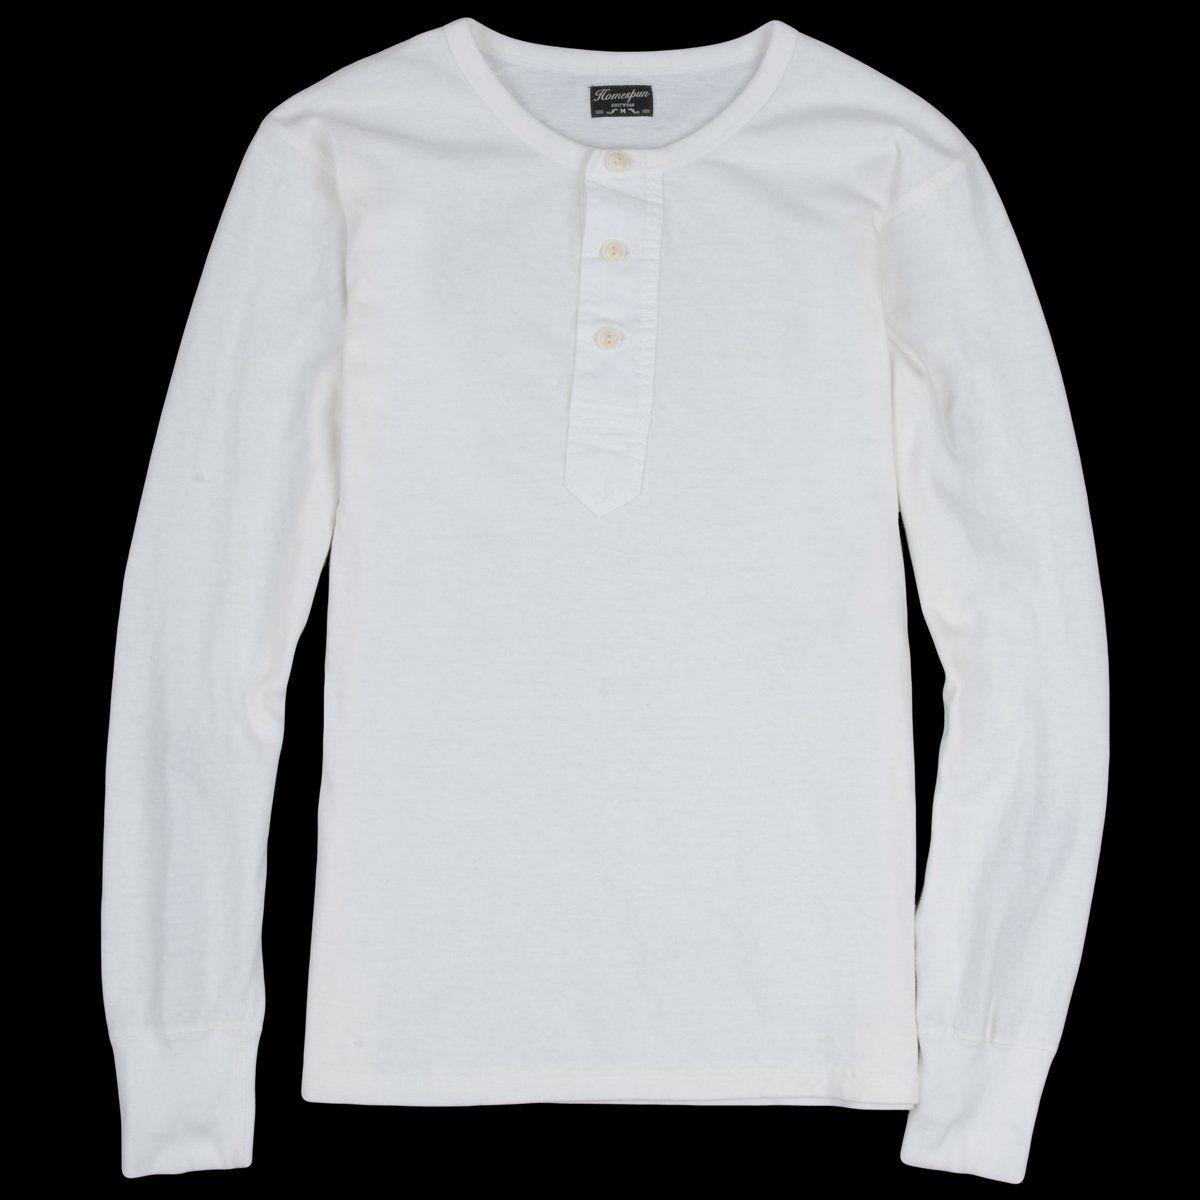 Homespun Knitwear Zimbabwe Jersey Surplus Henley In Off White Henley Retro Outfits Knitwear